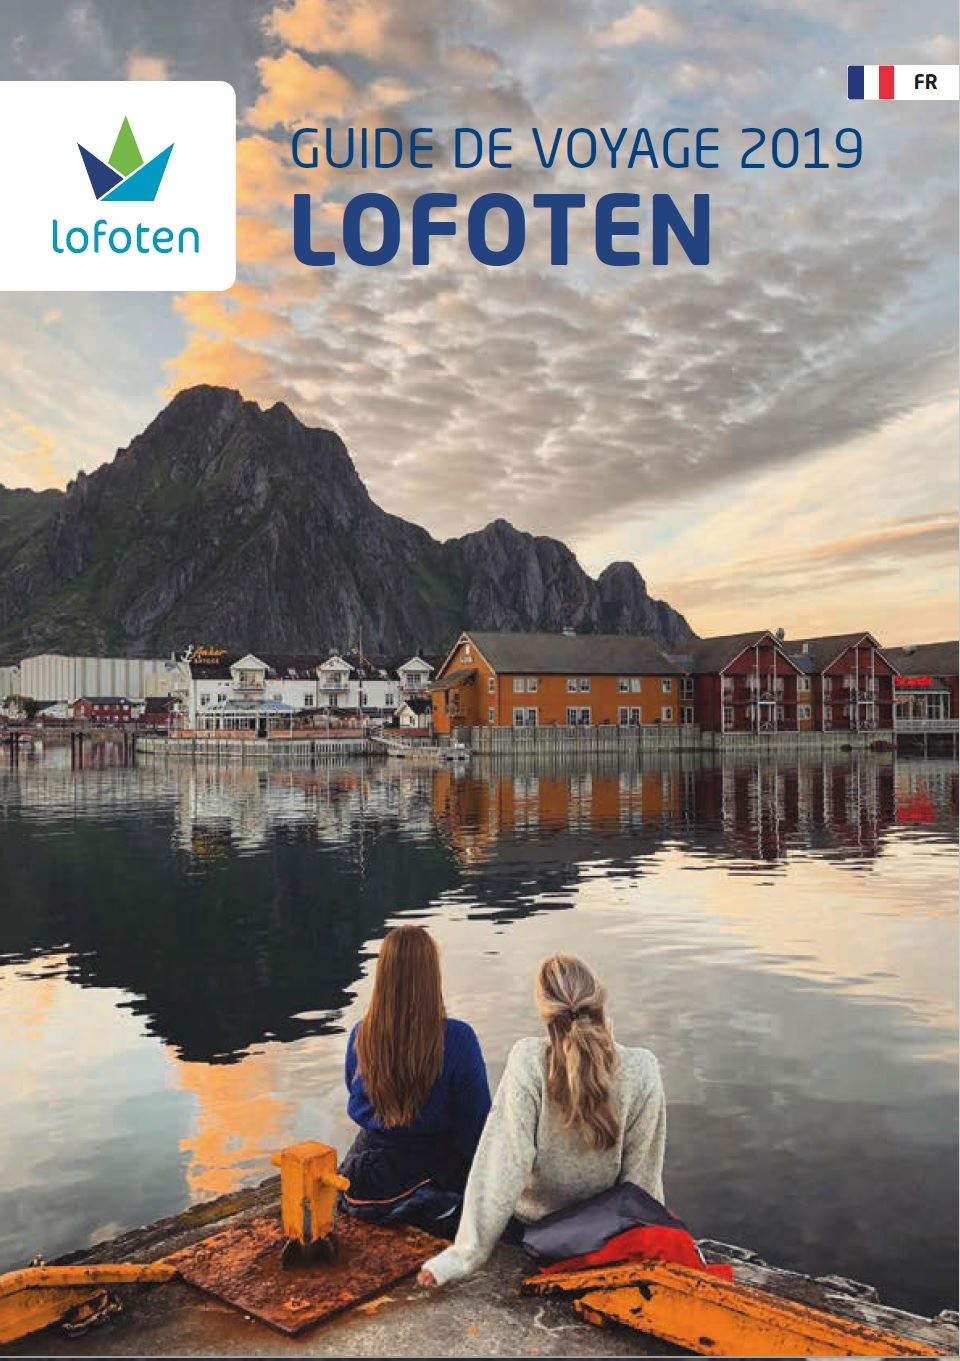 Travel Guide Lofoten 2019 - French